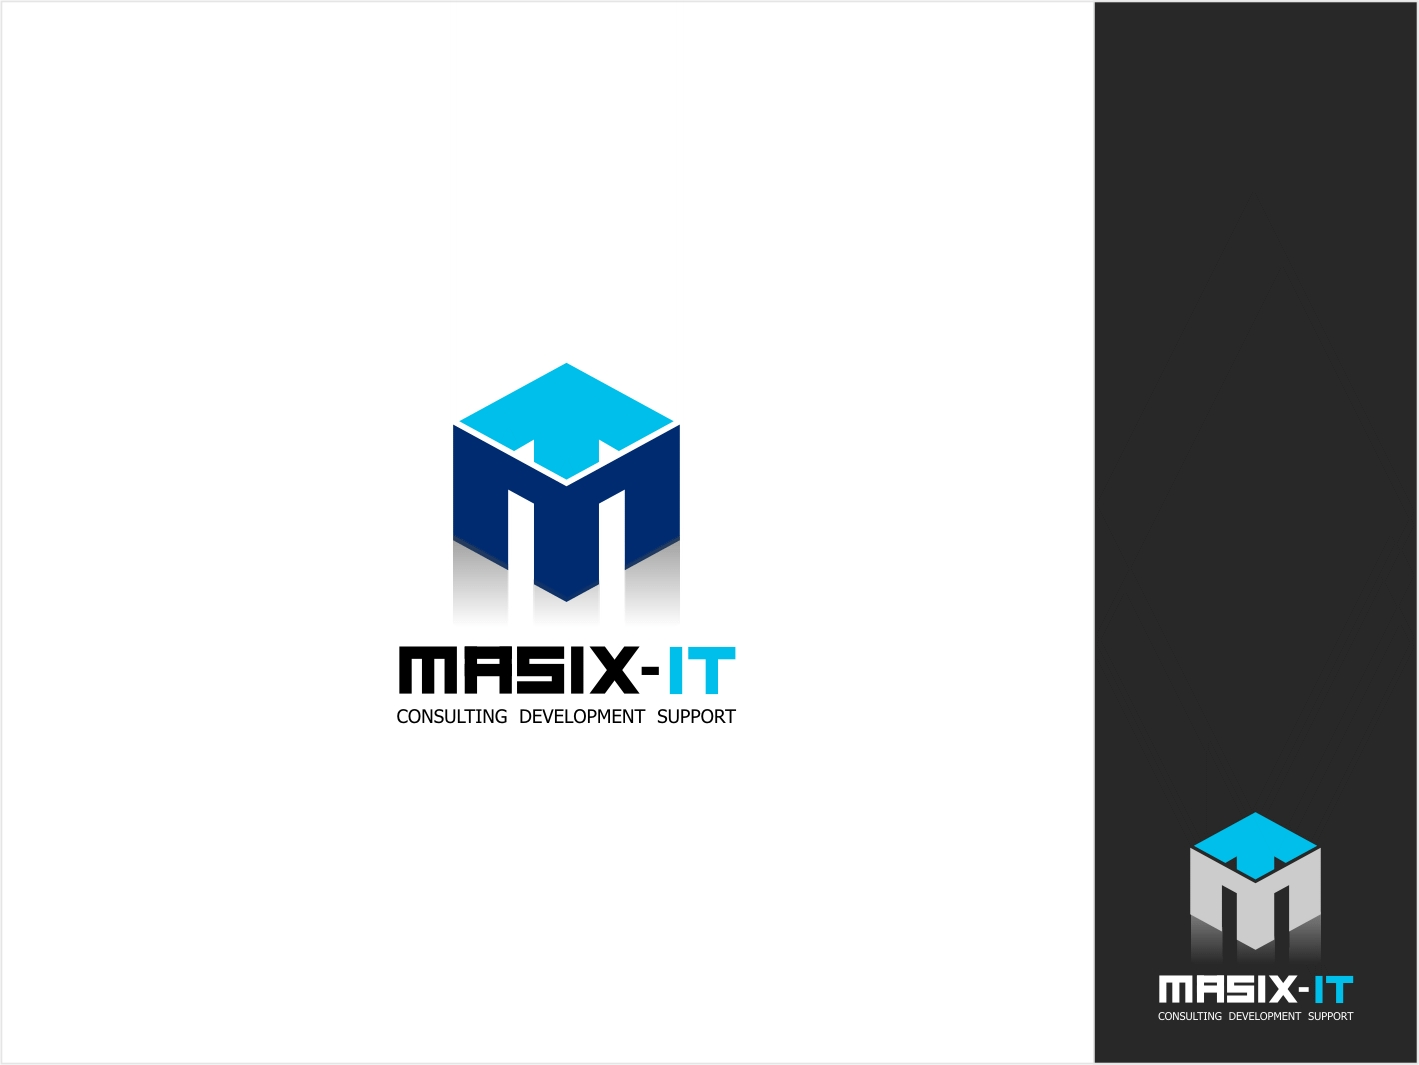 design #120 of mldesign